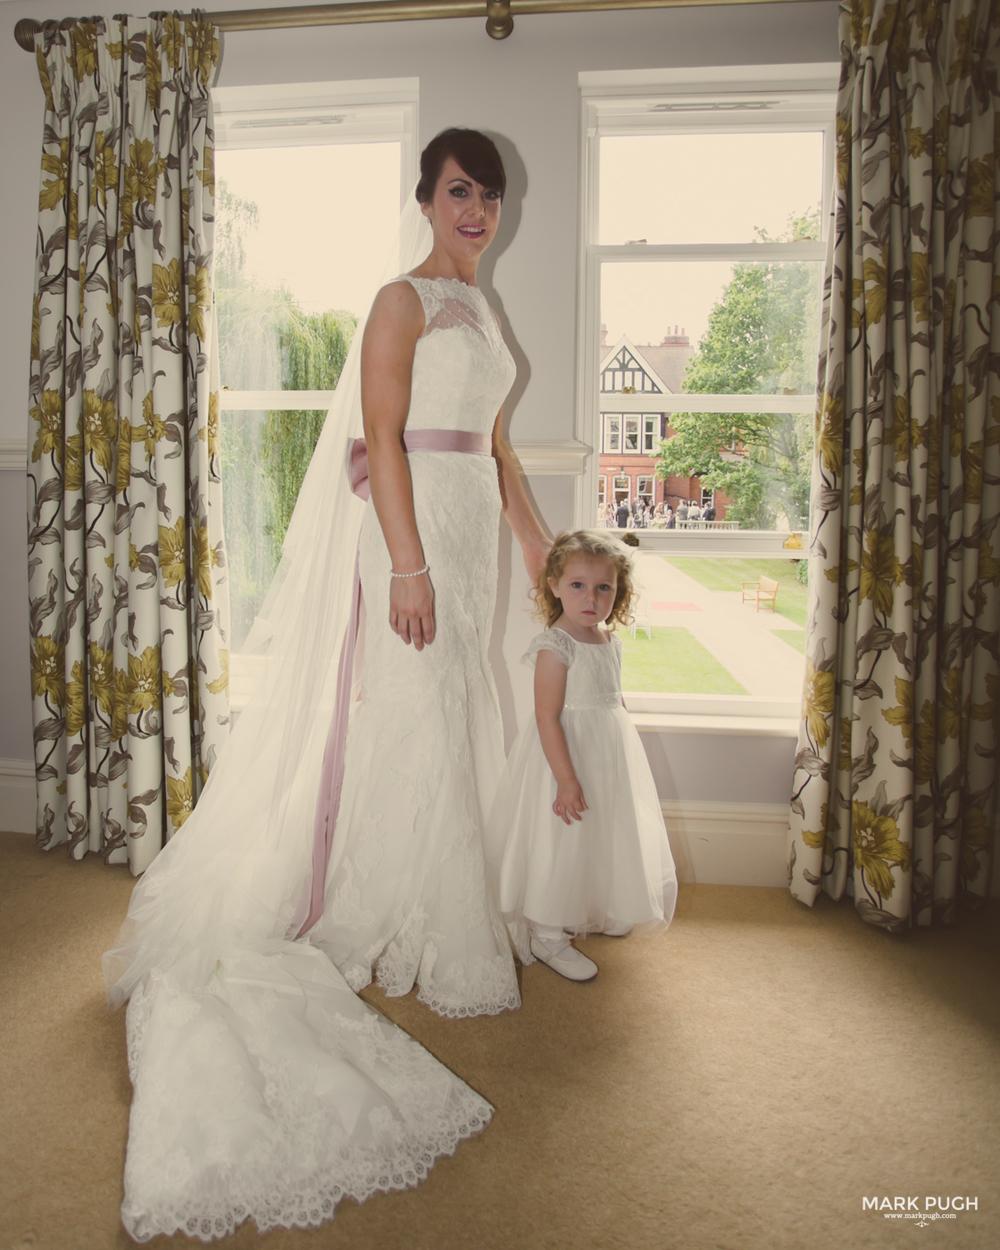 049 - Wedding Photography at The Dower House Hotel Manor Estate Woodhall Spa Lincolnshire LN10 6PY by Mark Pugh www.mpmedia.co.uk www.markpugh.com.jpg